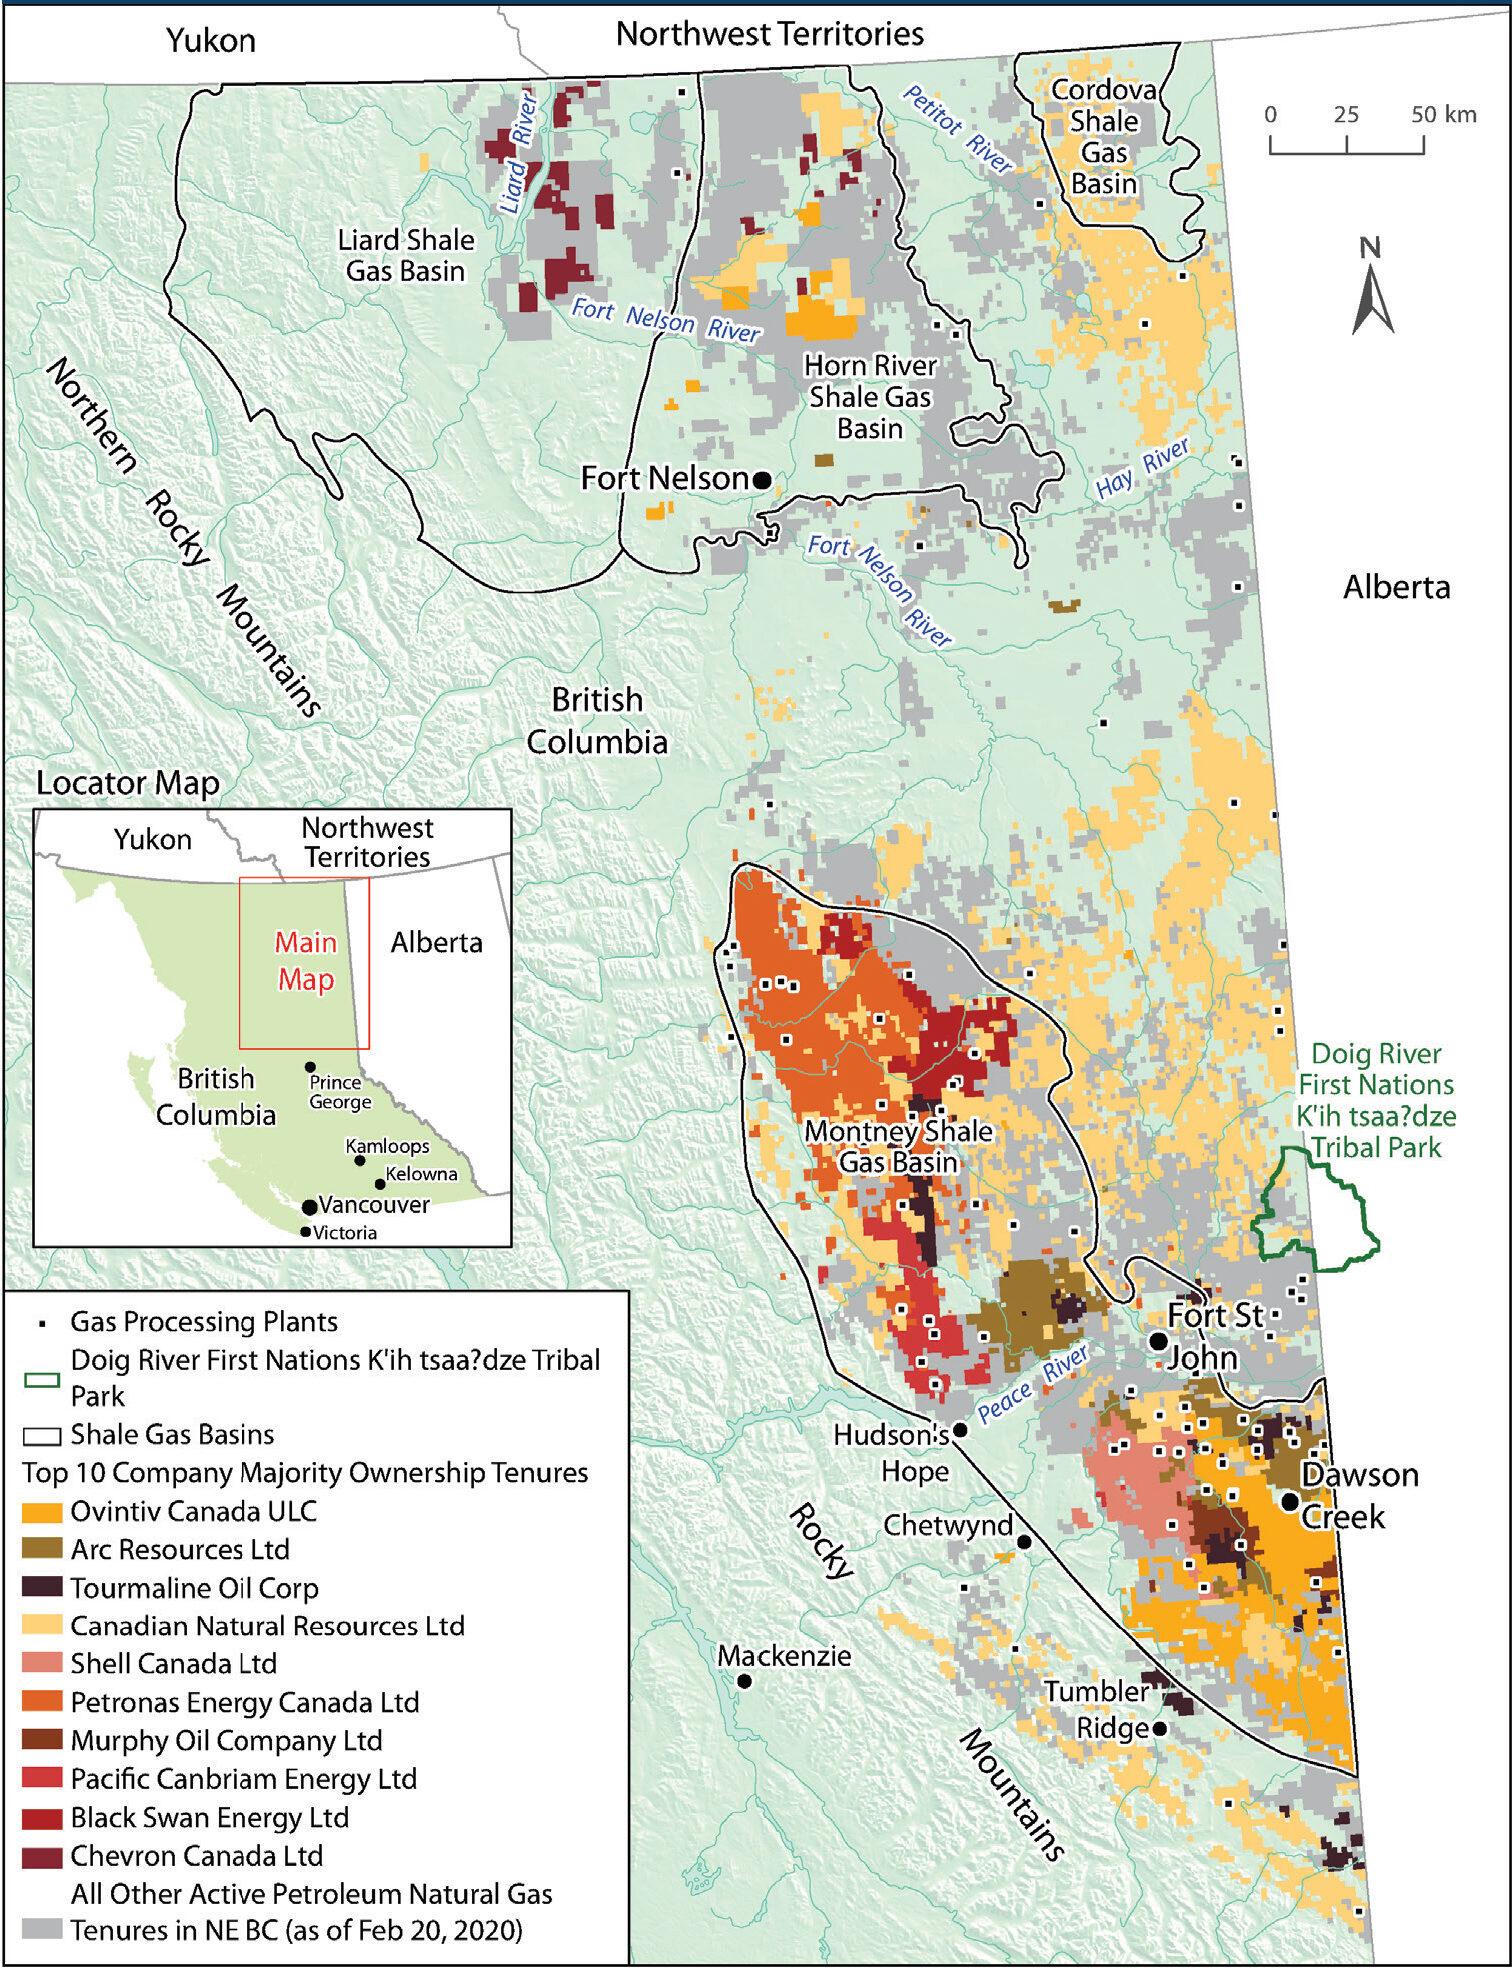 B.C. top 10 fracking companies tenure map